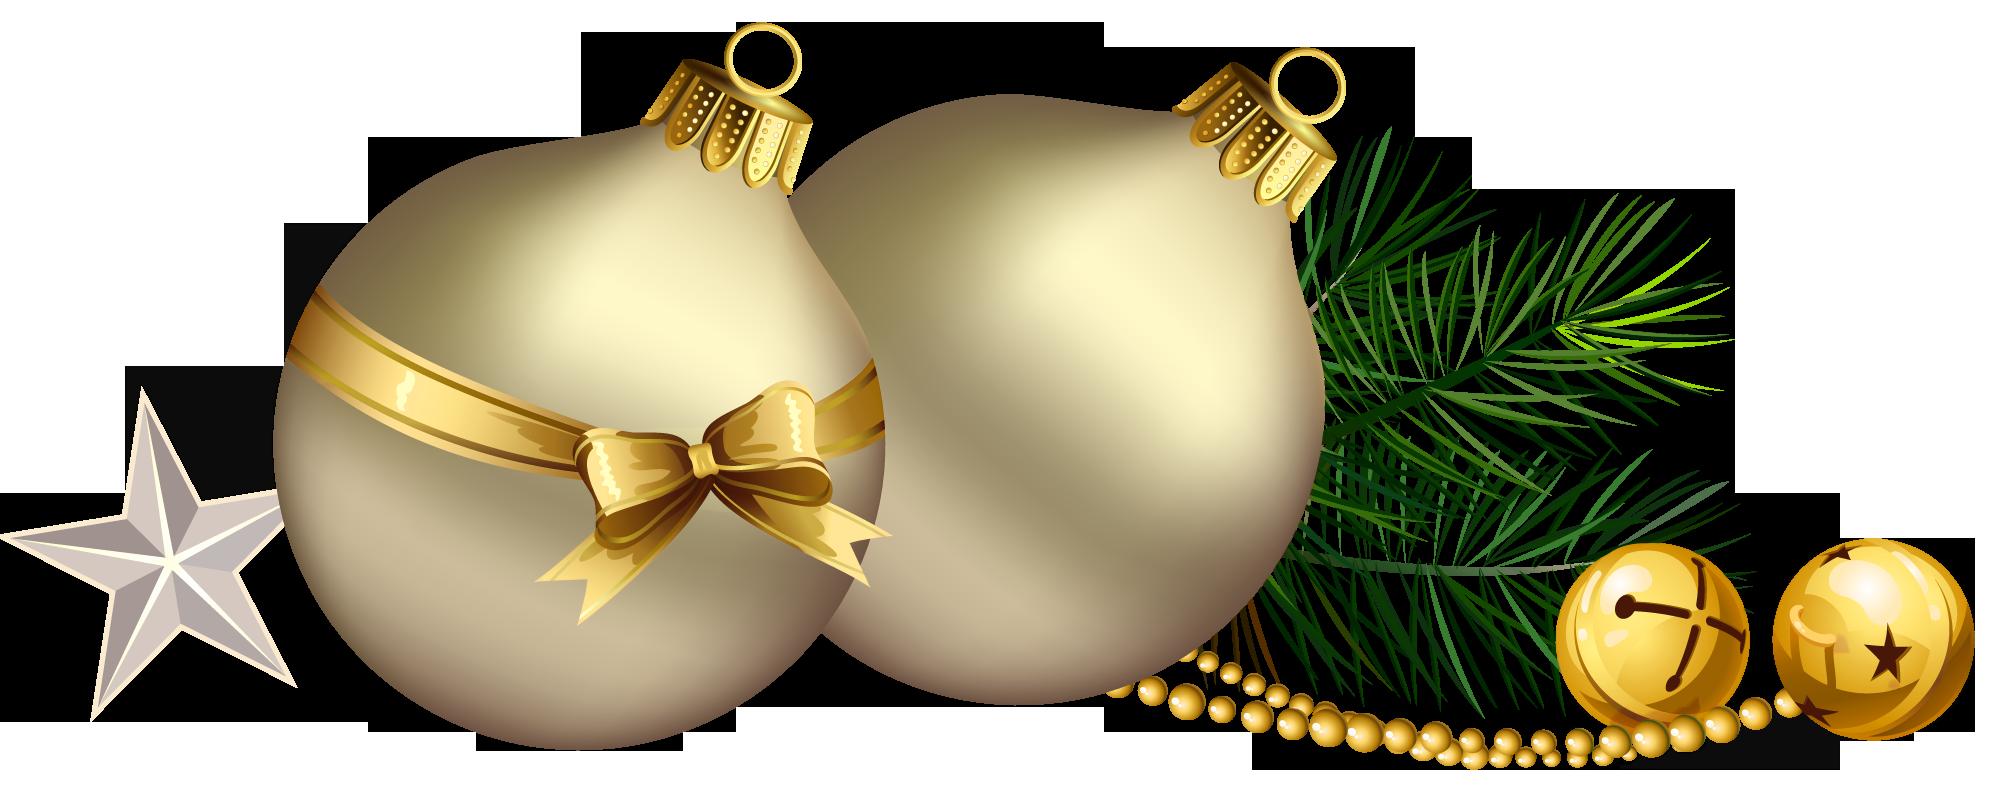 Clipart stars ball. Christmas balls with pine